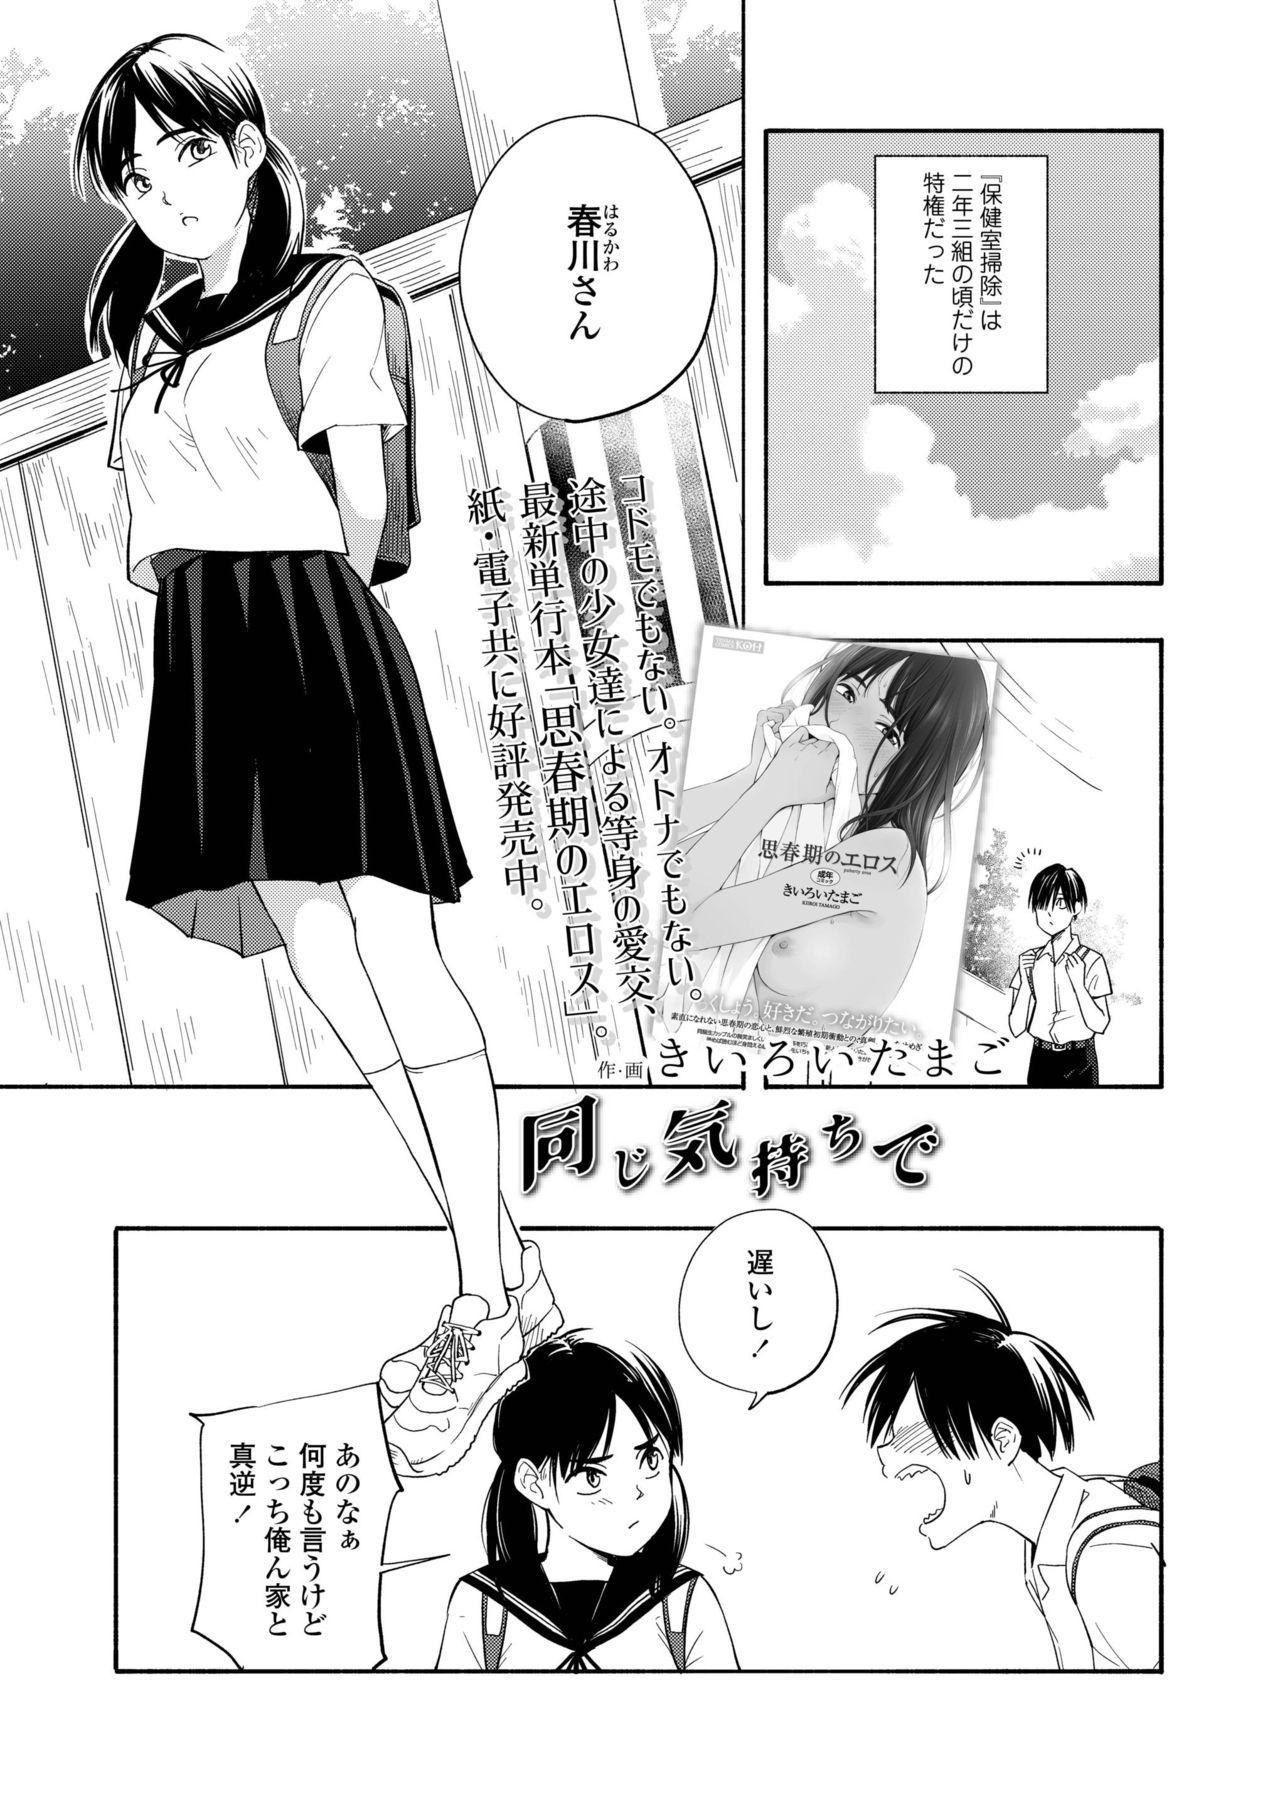 COMIC AOHA 2019 Haru 324